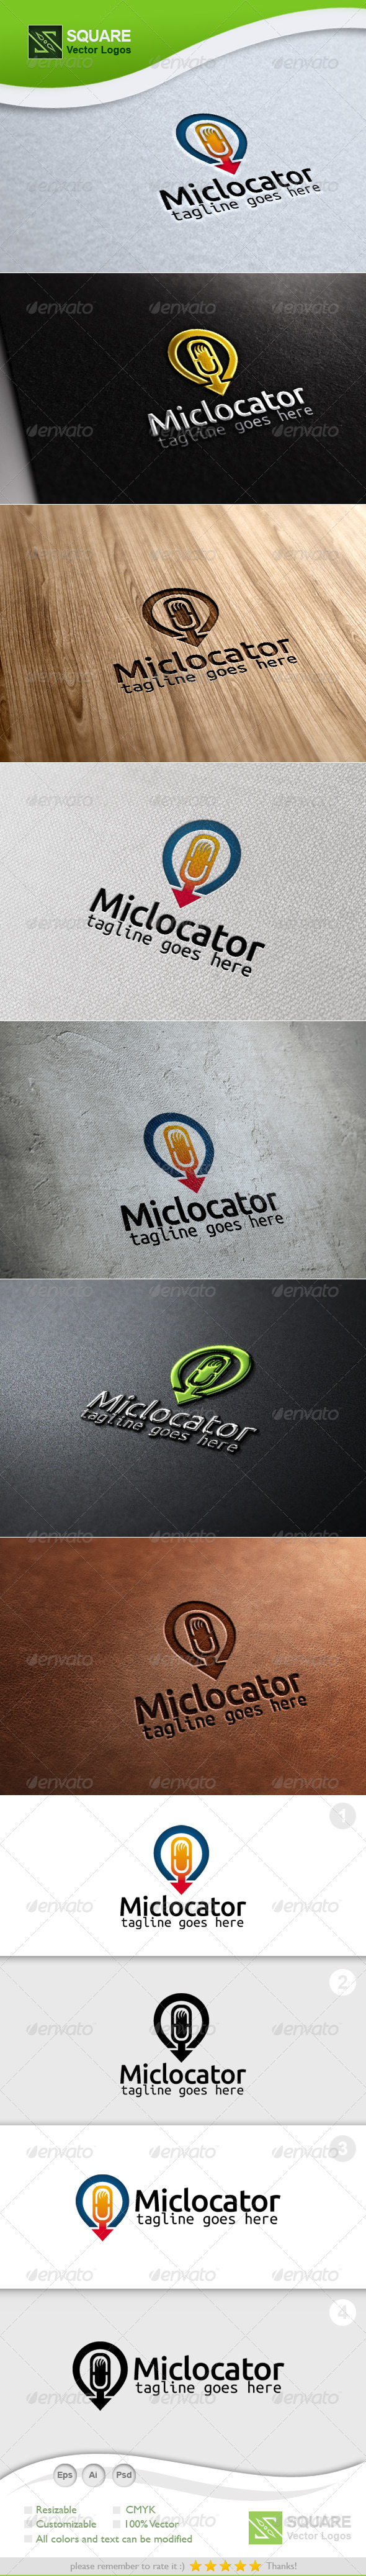 Mic, Locator Vector Logo Template - Symbols Logo Templates